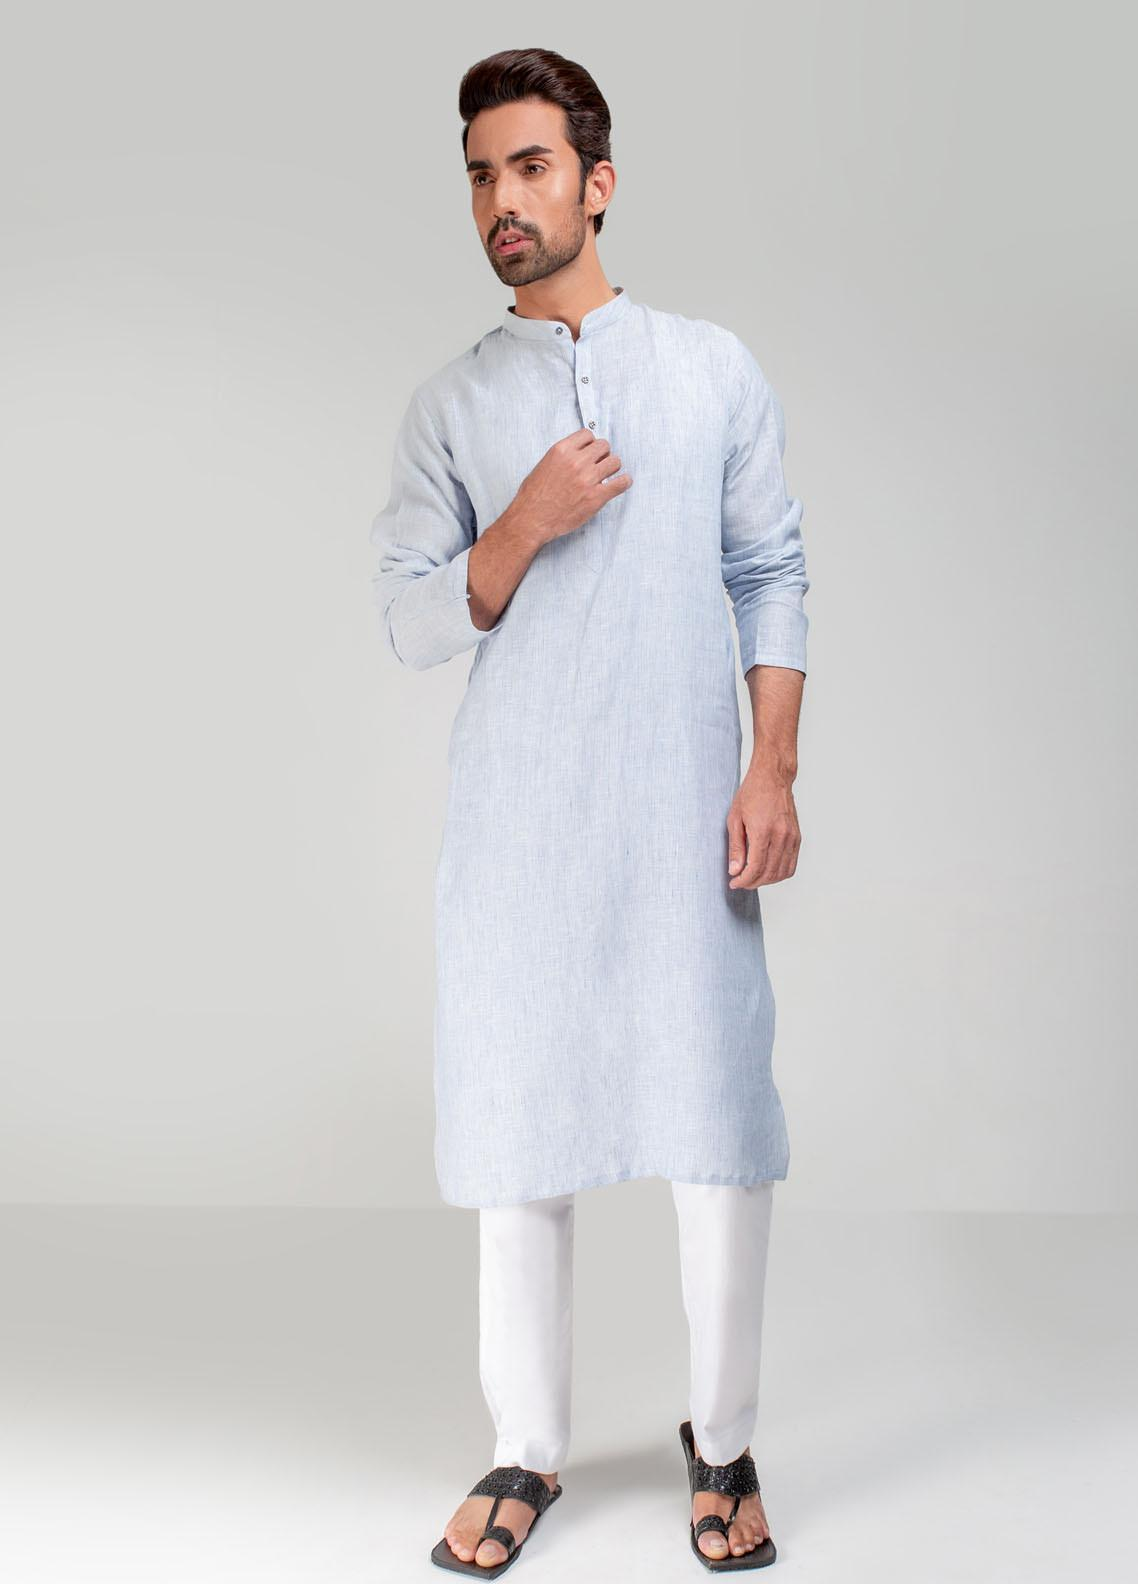 Project Linen Casual Men Kurta - White/Blue PLSK-010